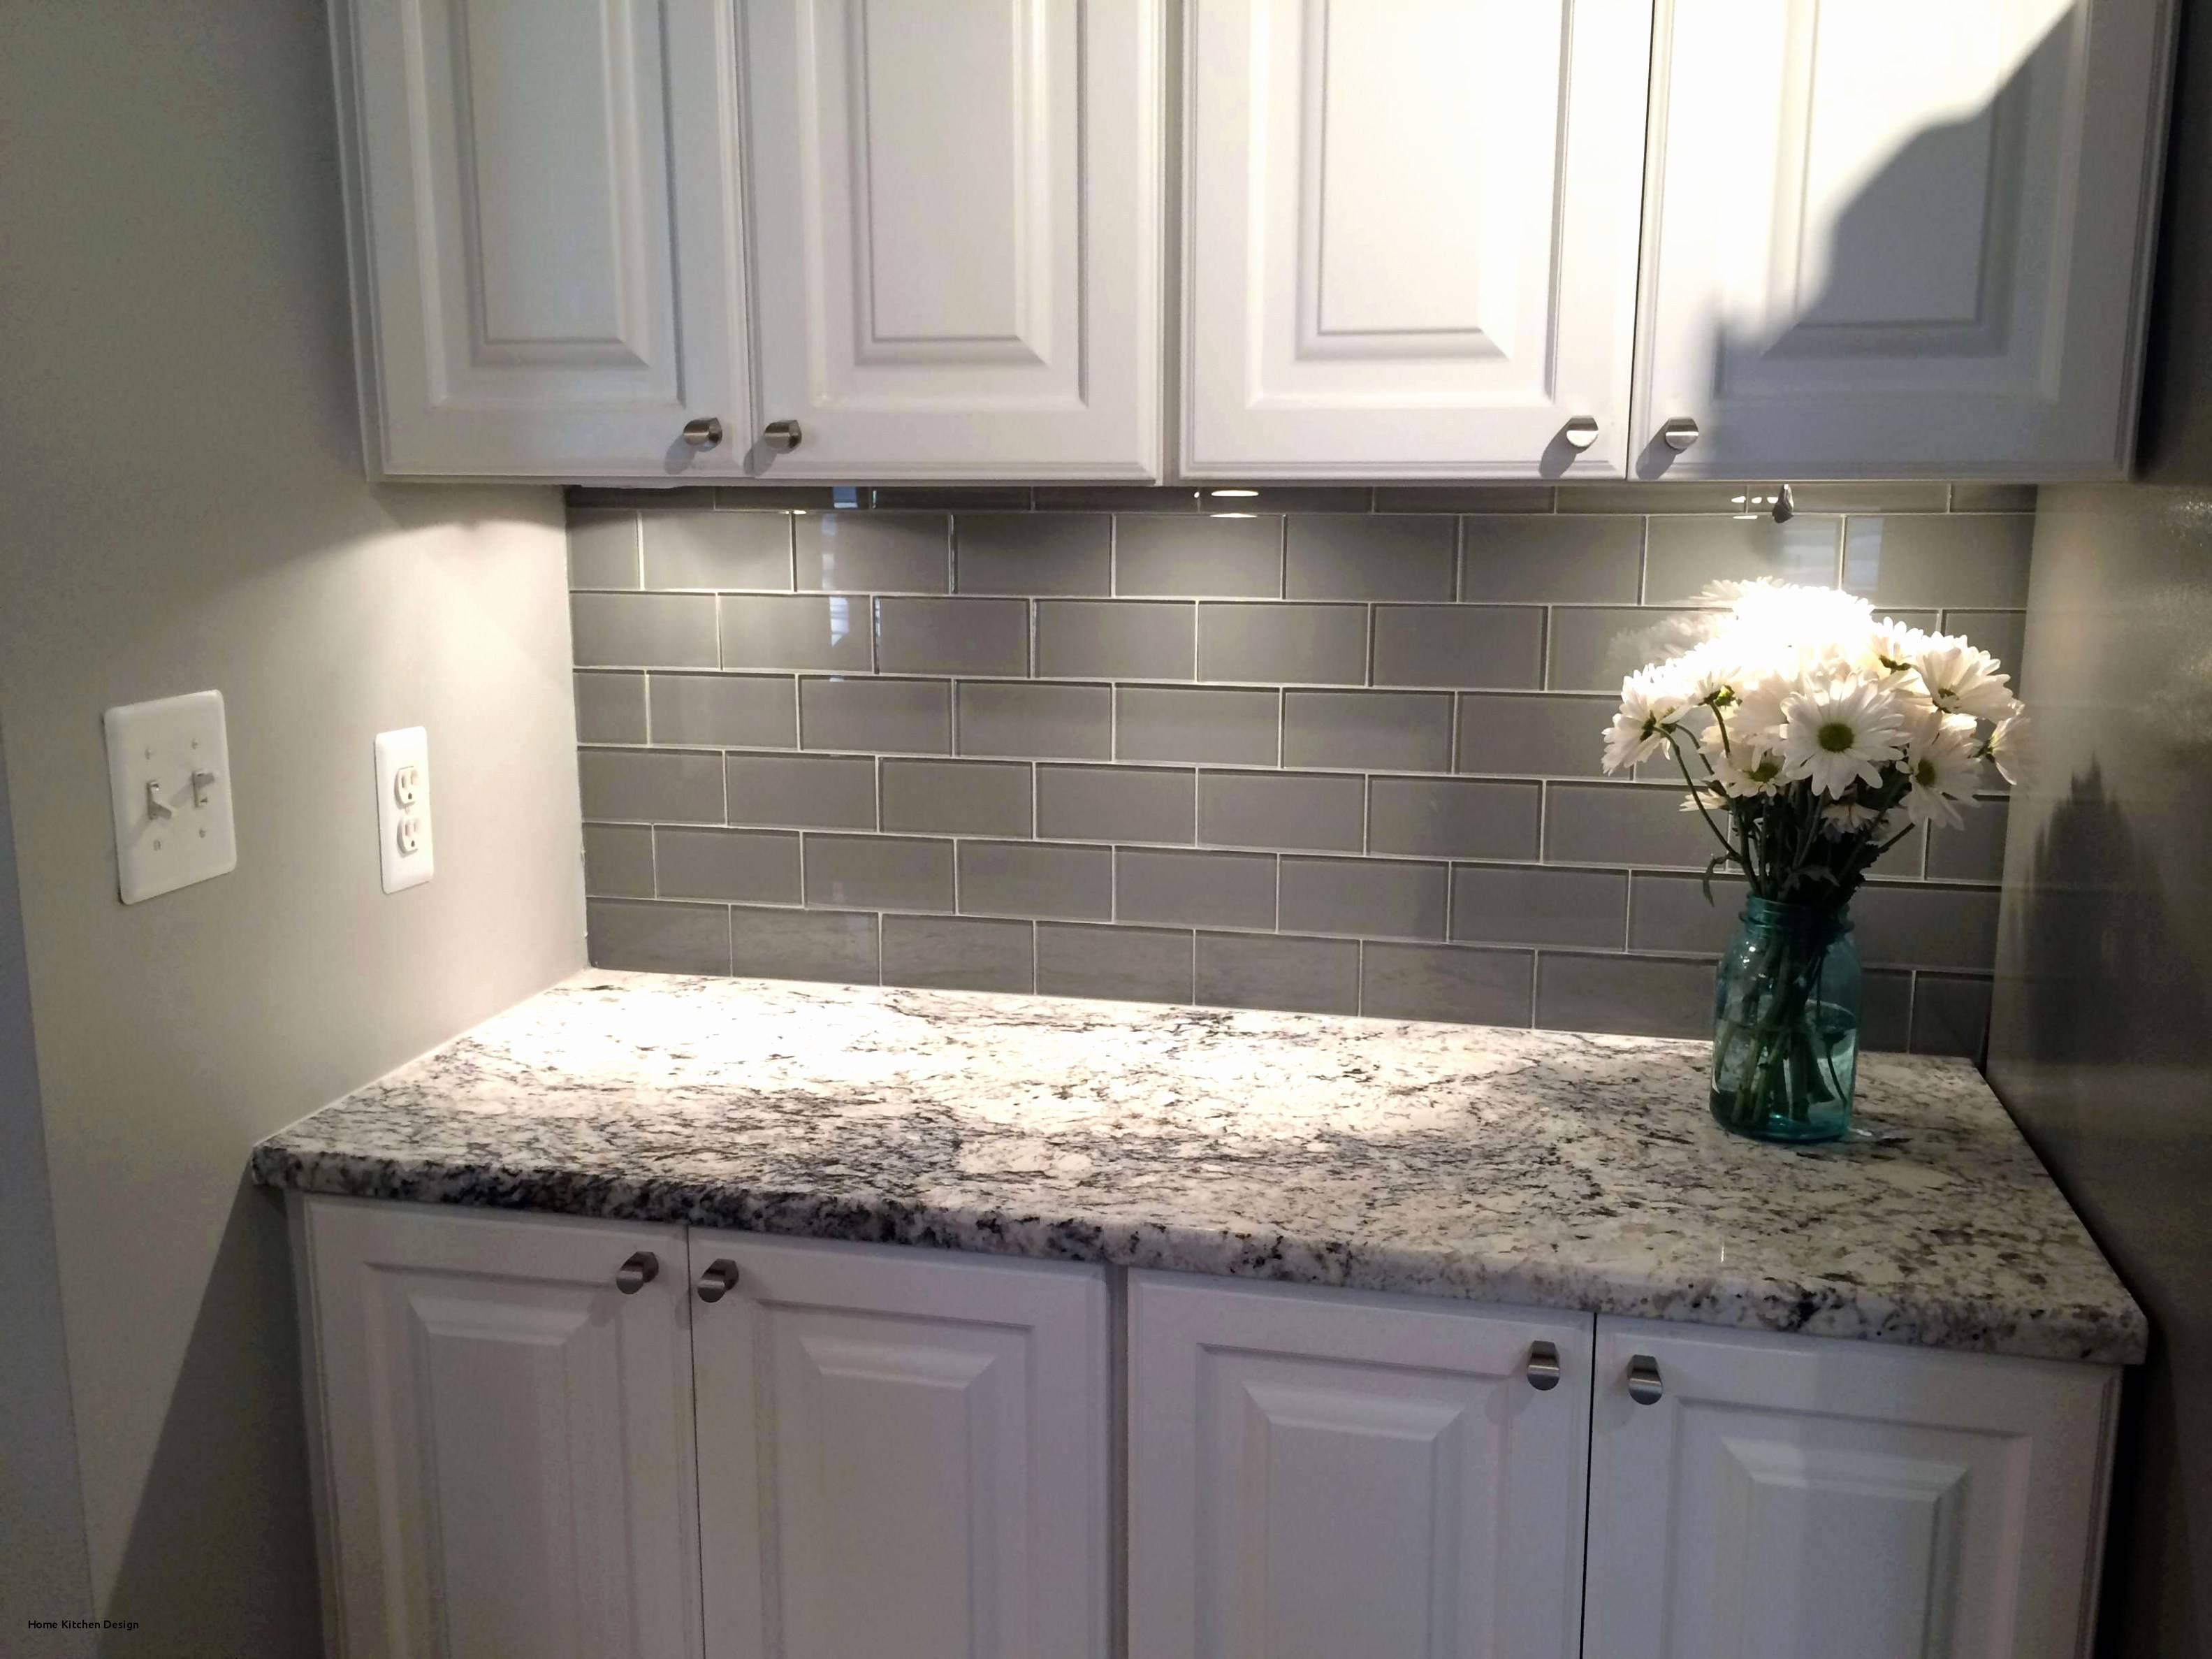 granite kitchens elegant subway tile backsplash easy best kitchen design 0d design kitchen of granite kitchens